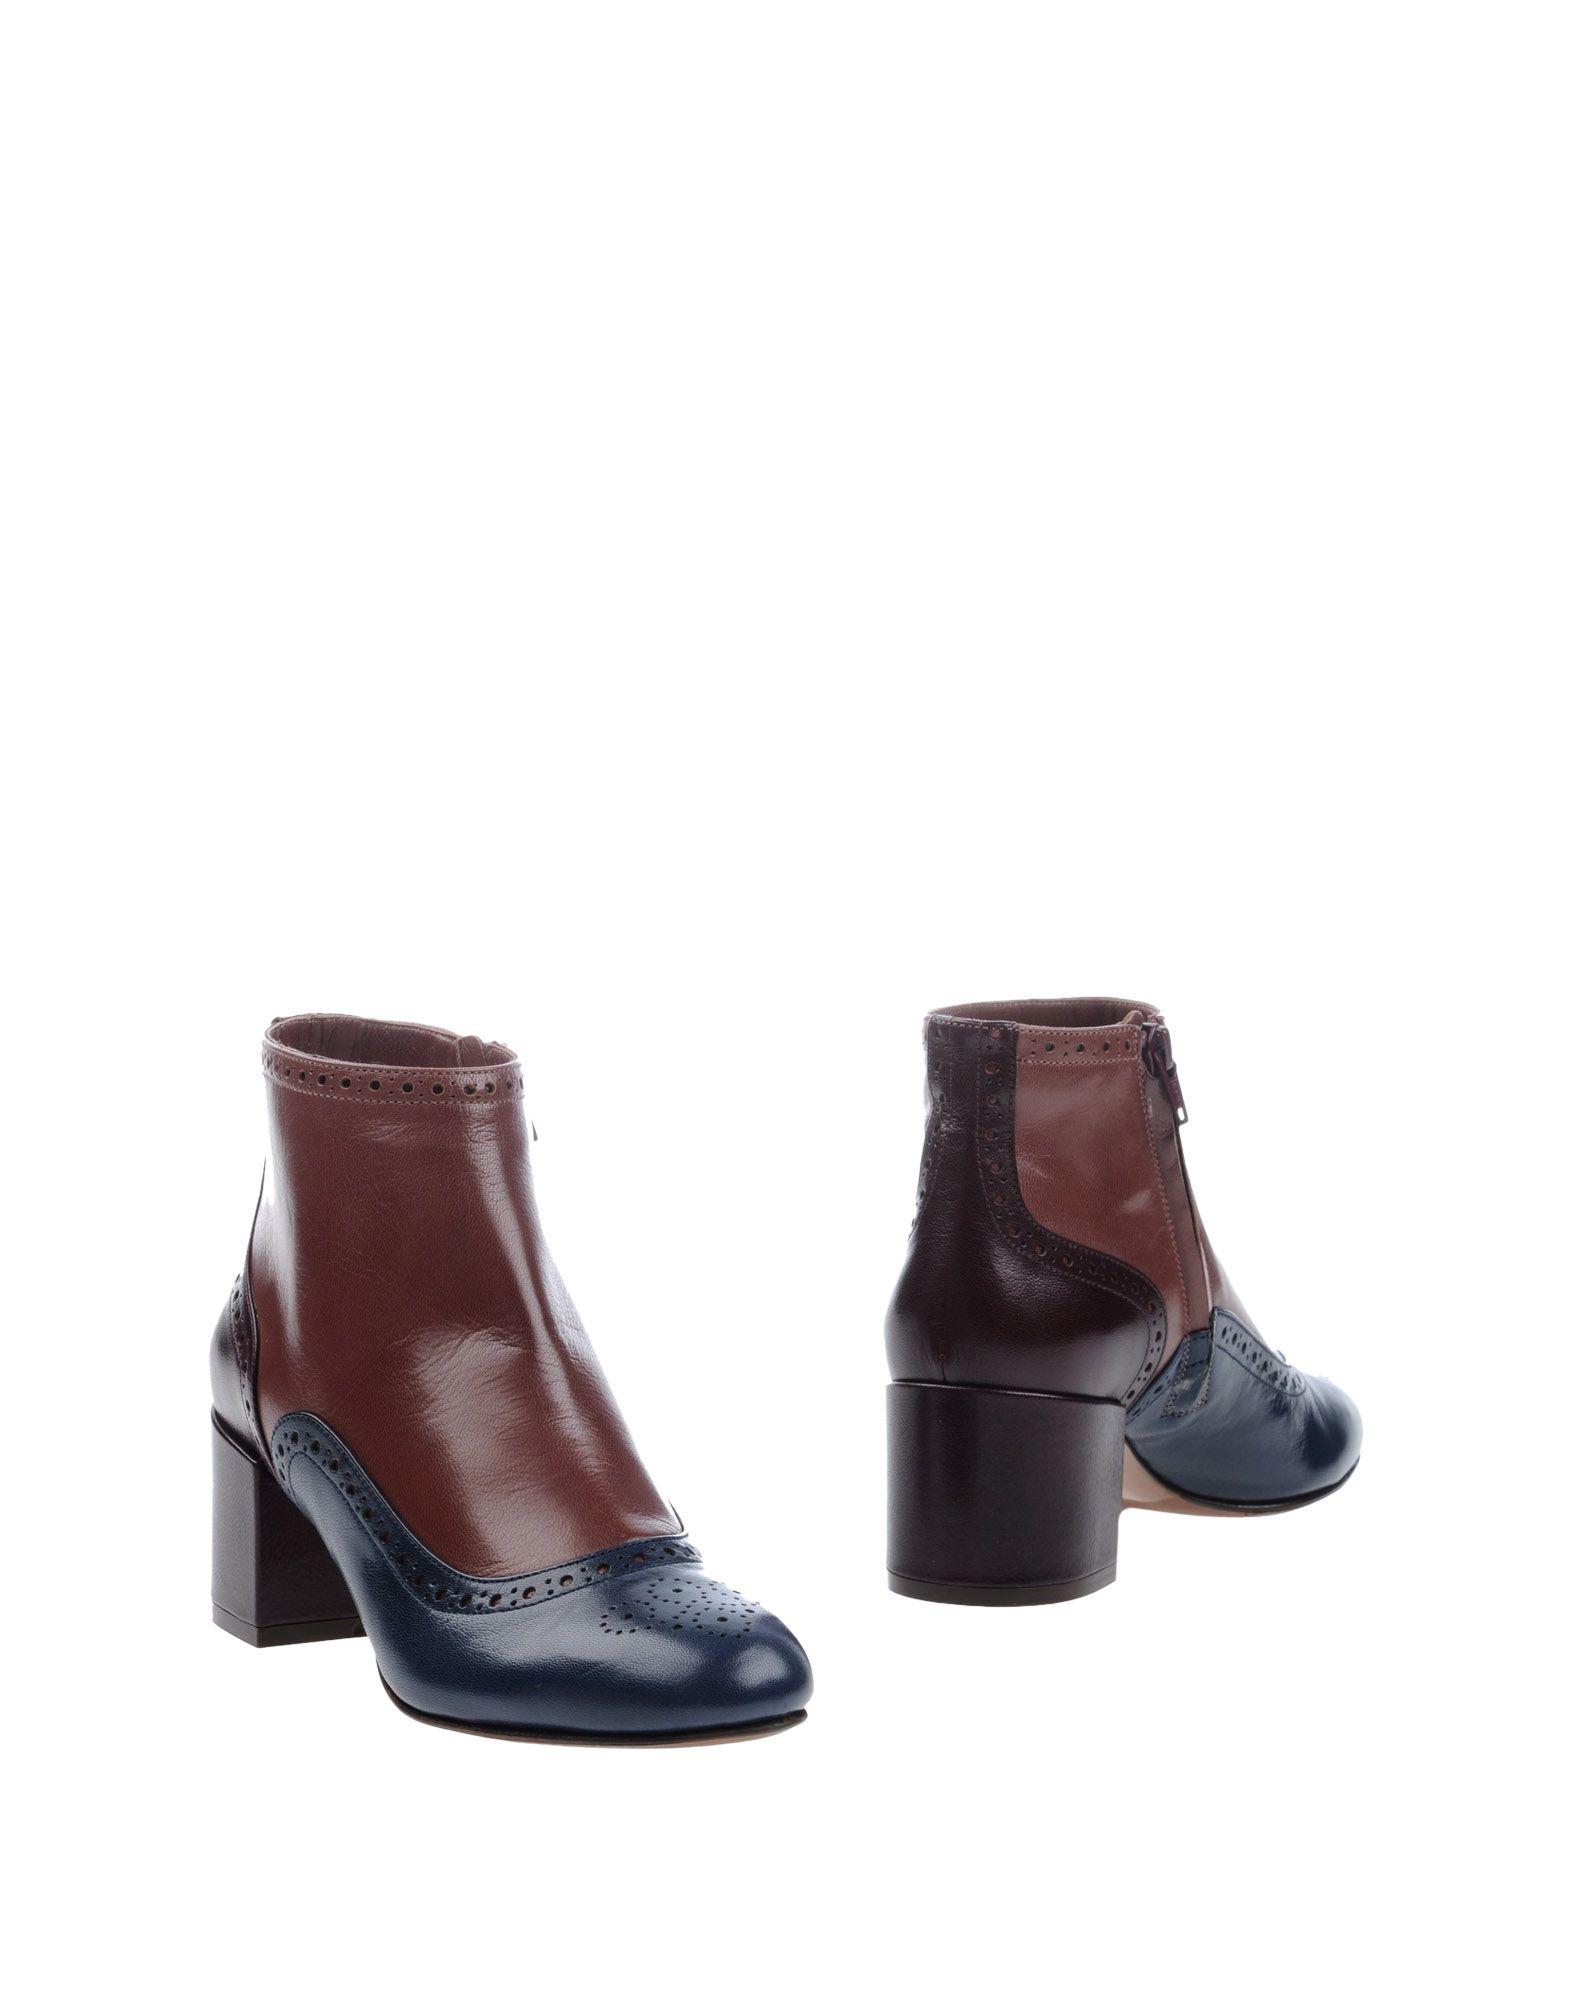 Rabatt Stiefelette Schuhe L' Autre Chose Stiefelette Rabatt Damen  11258287JT 61f2a3